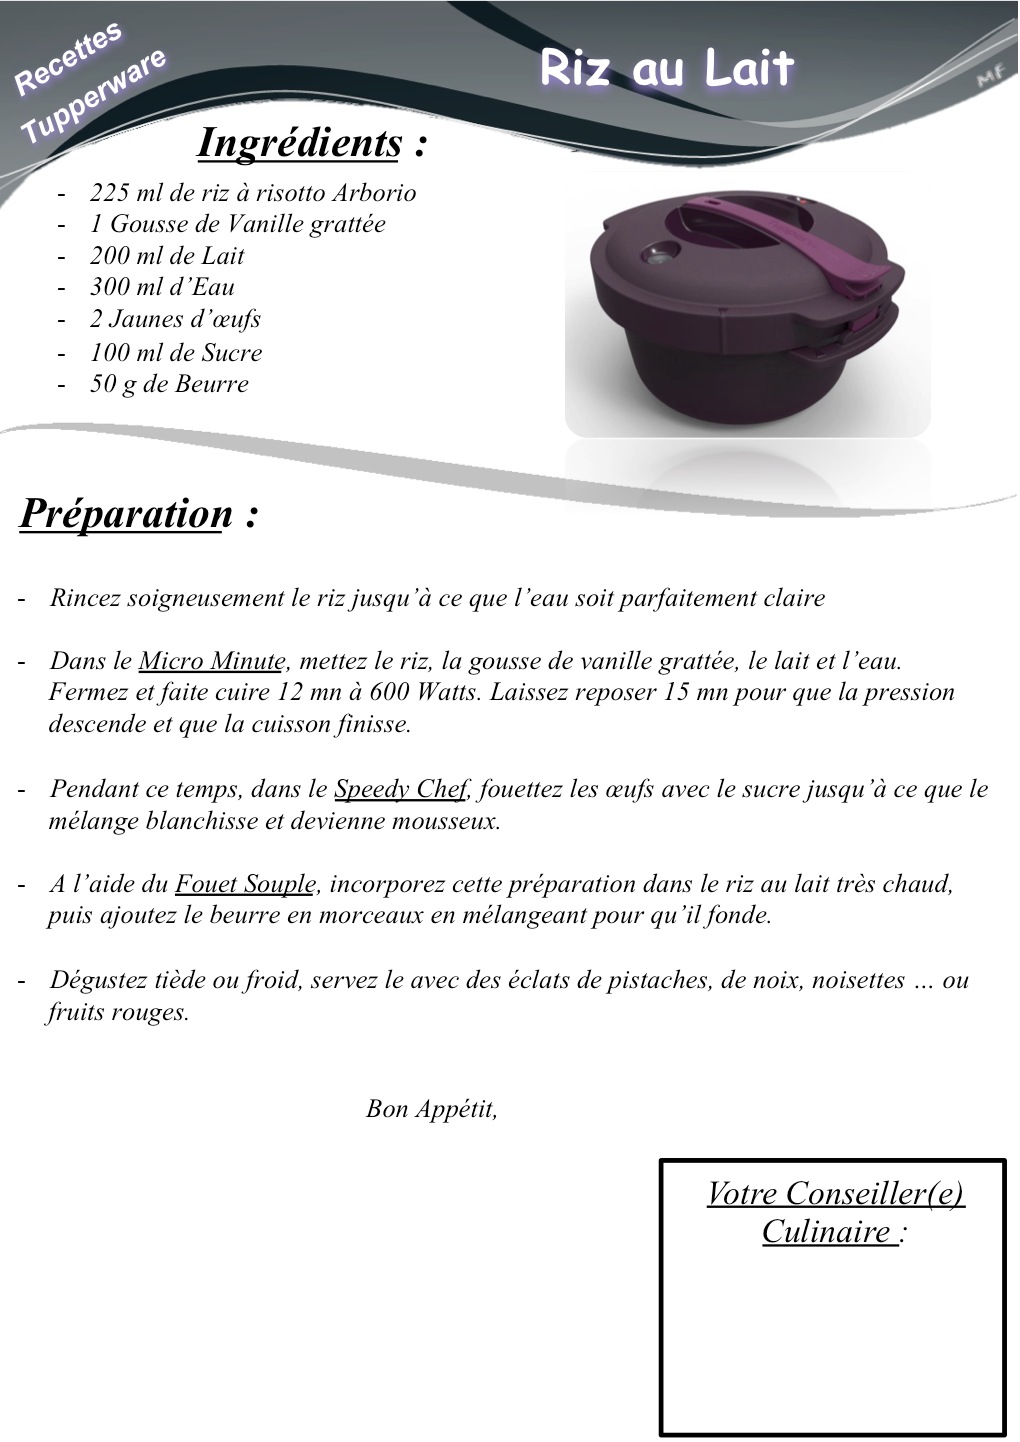 Ob ba7275 riz au lait micro minute 1020 1442 tupperware pinterest kiwi - Micro minute tupperware recette ...